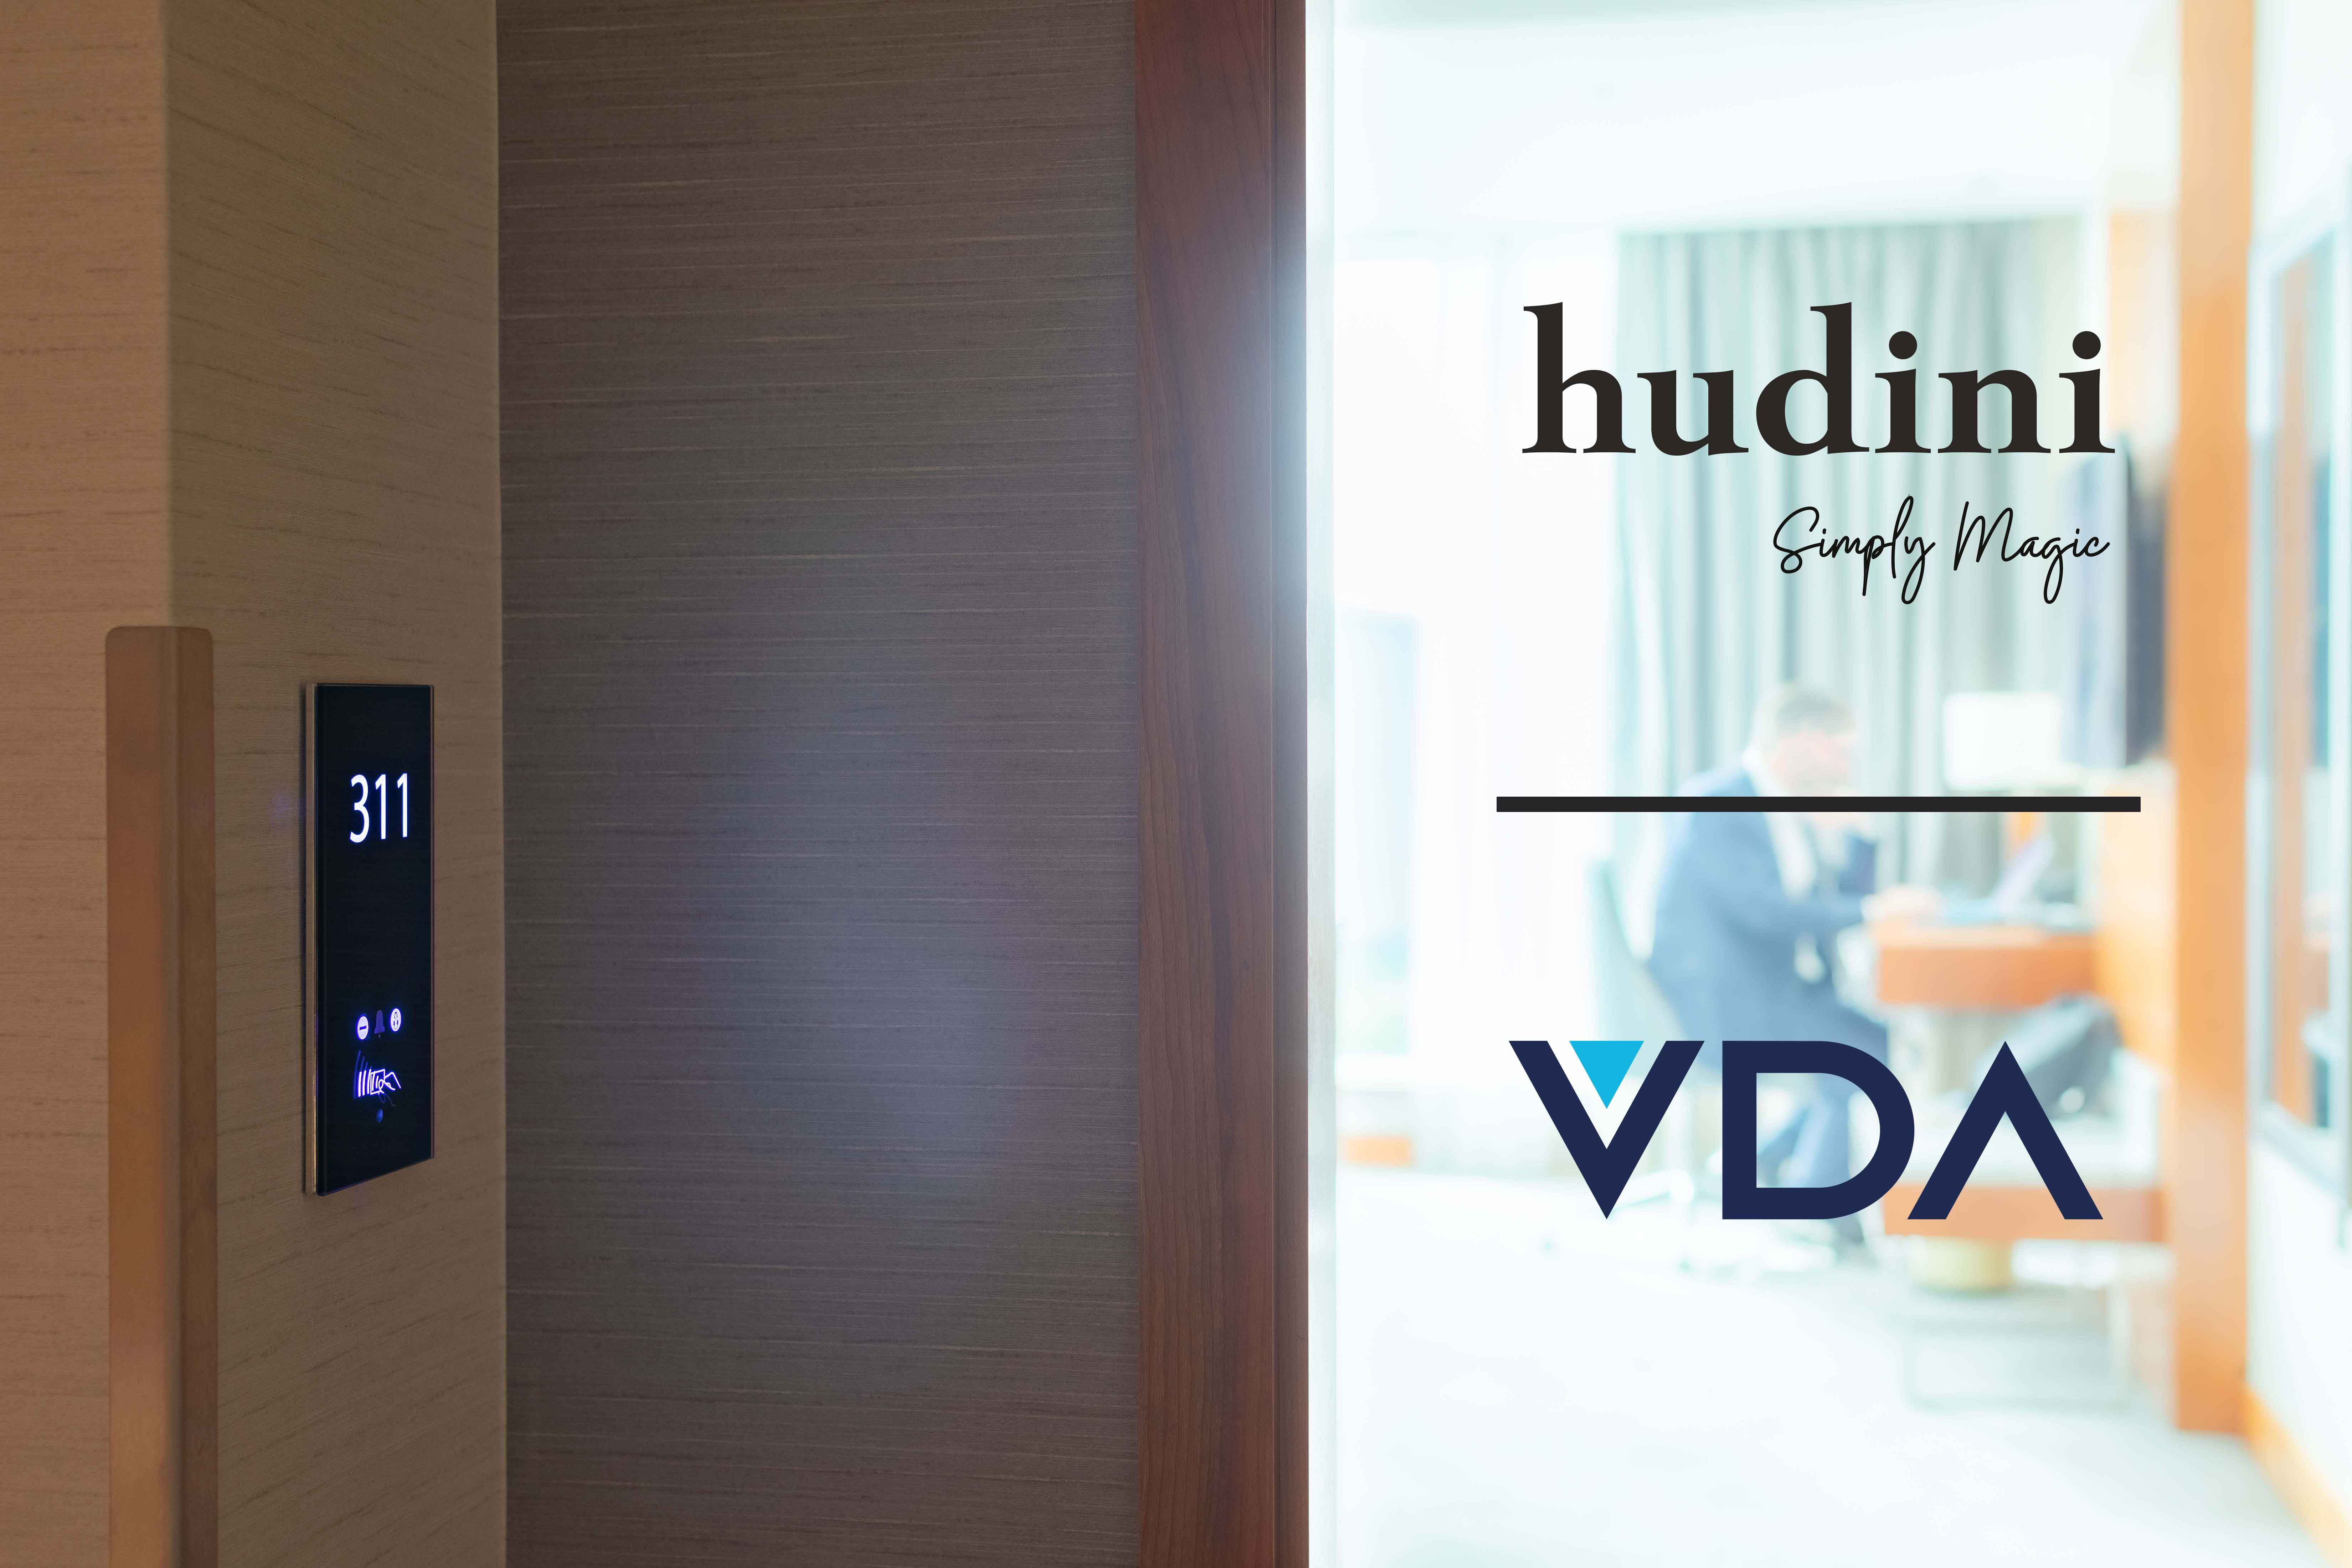 VDA Hudini integration - Smart Room - Room management System